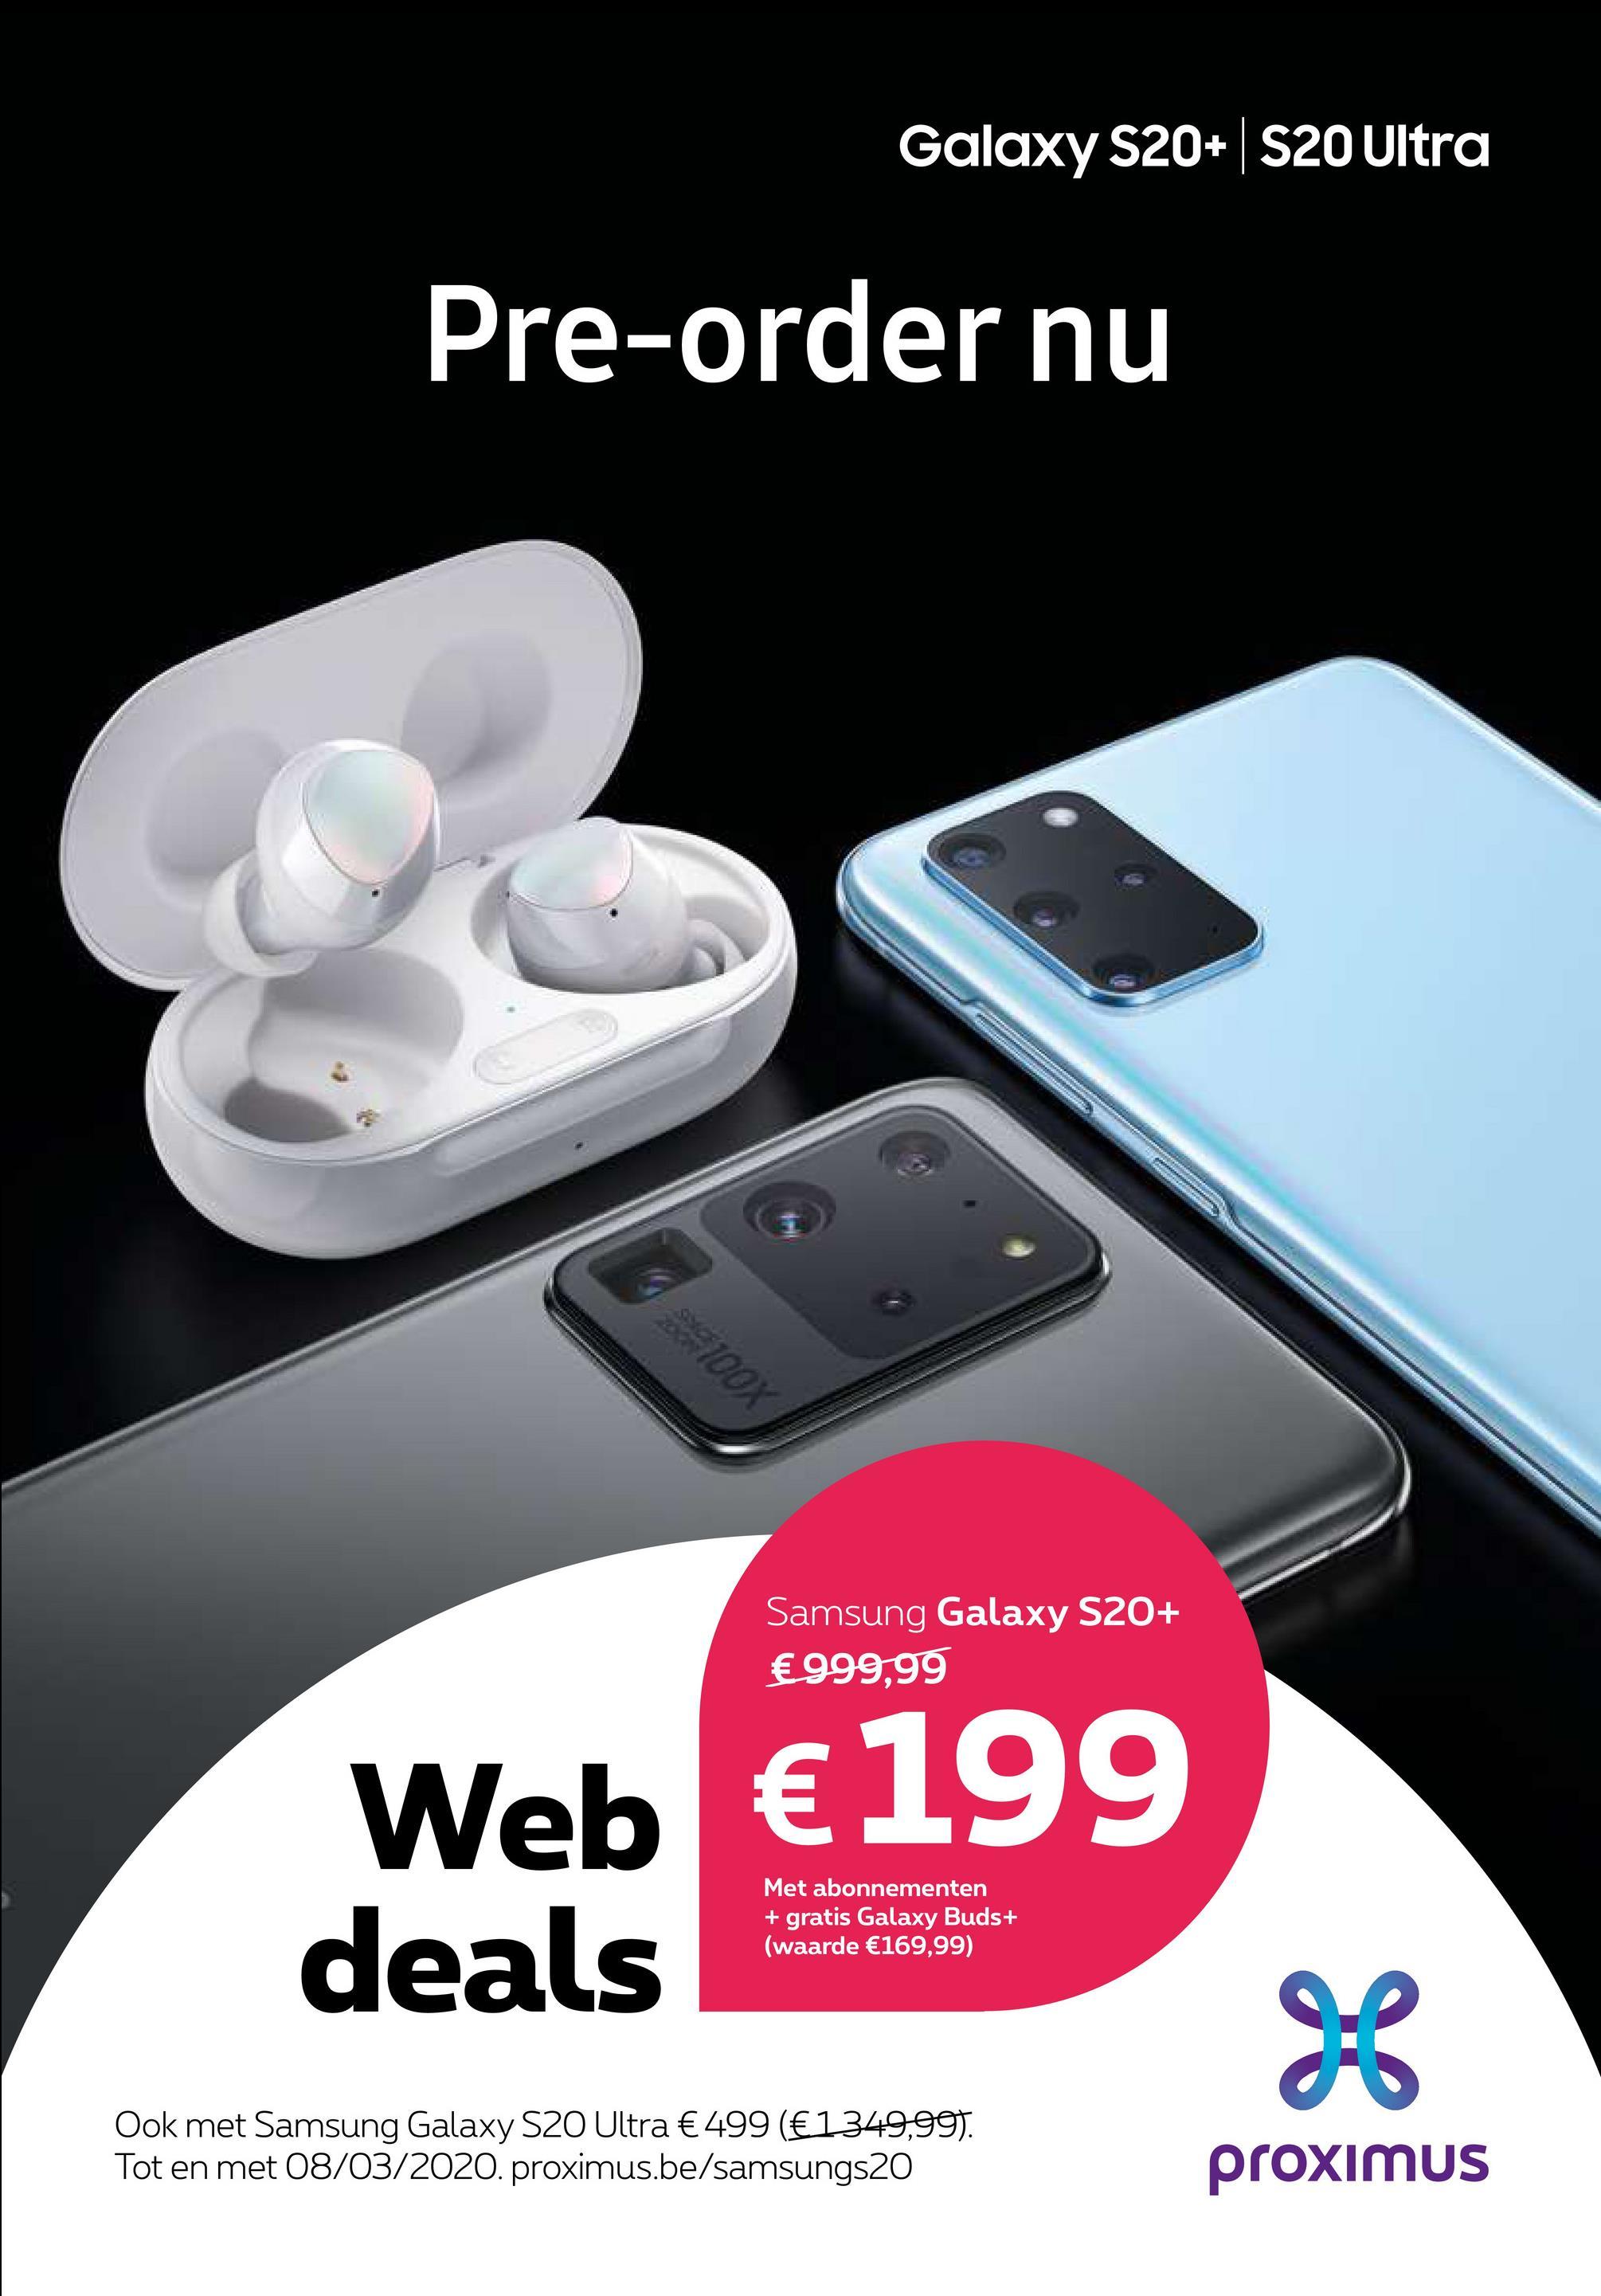 Galaxy S20+ S20 Ultra Pre-order nu ng 100% Samsung Galaxy S20+ €999,99 Web € 199 deals Met abonnementen + gratis Galaxy Buds+ (waarde €169,99) Ook met Samsung Galaxy S20 Ultra € 499 (€1349,99). Tot en met 08/03/2020. proximus.be/samsungs20 proximus